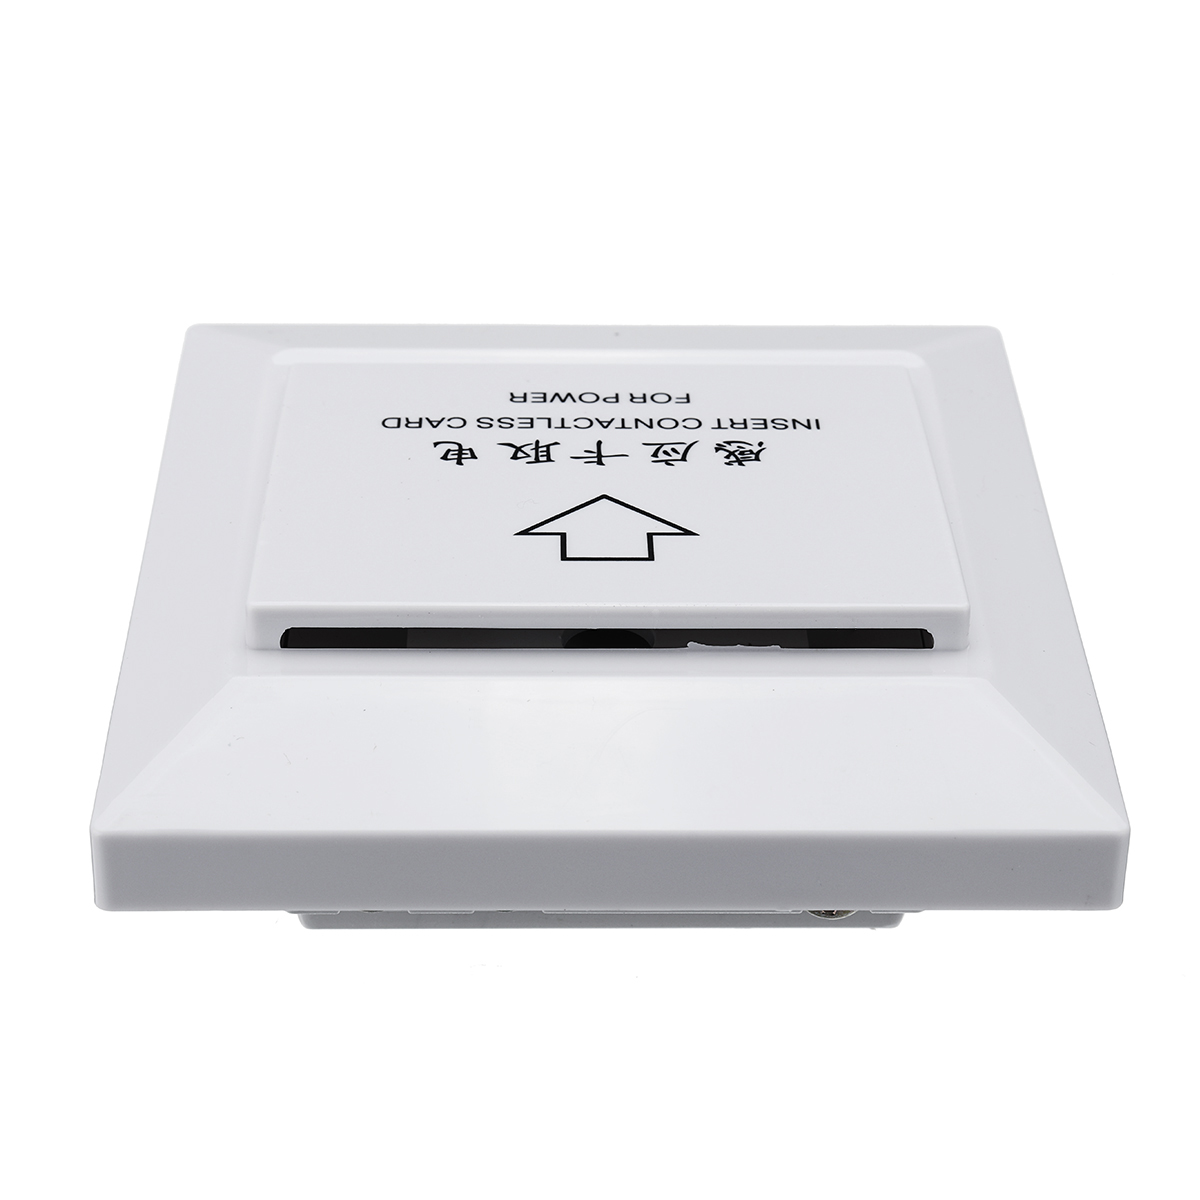 Hotel Card Switch Energy Saving Switch Key Card Sensor Switch Electricity Panel Switch